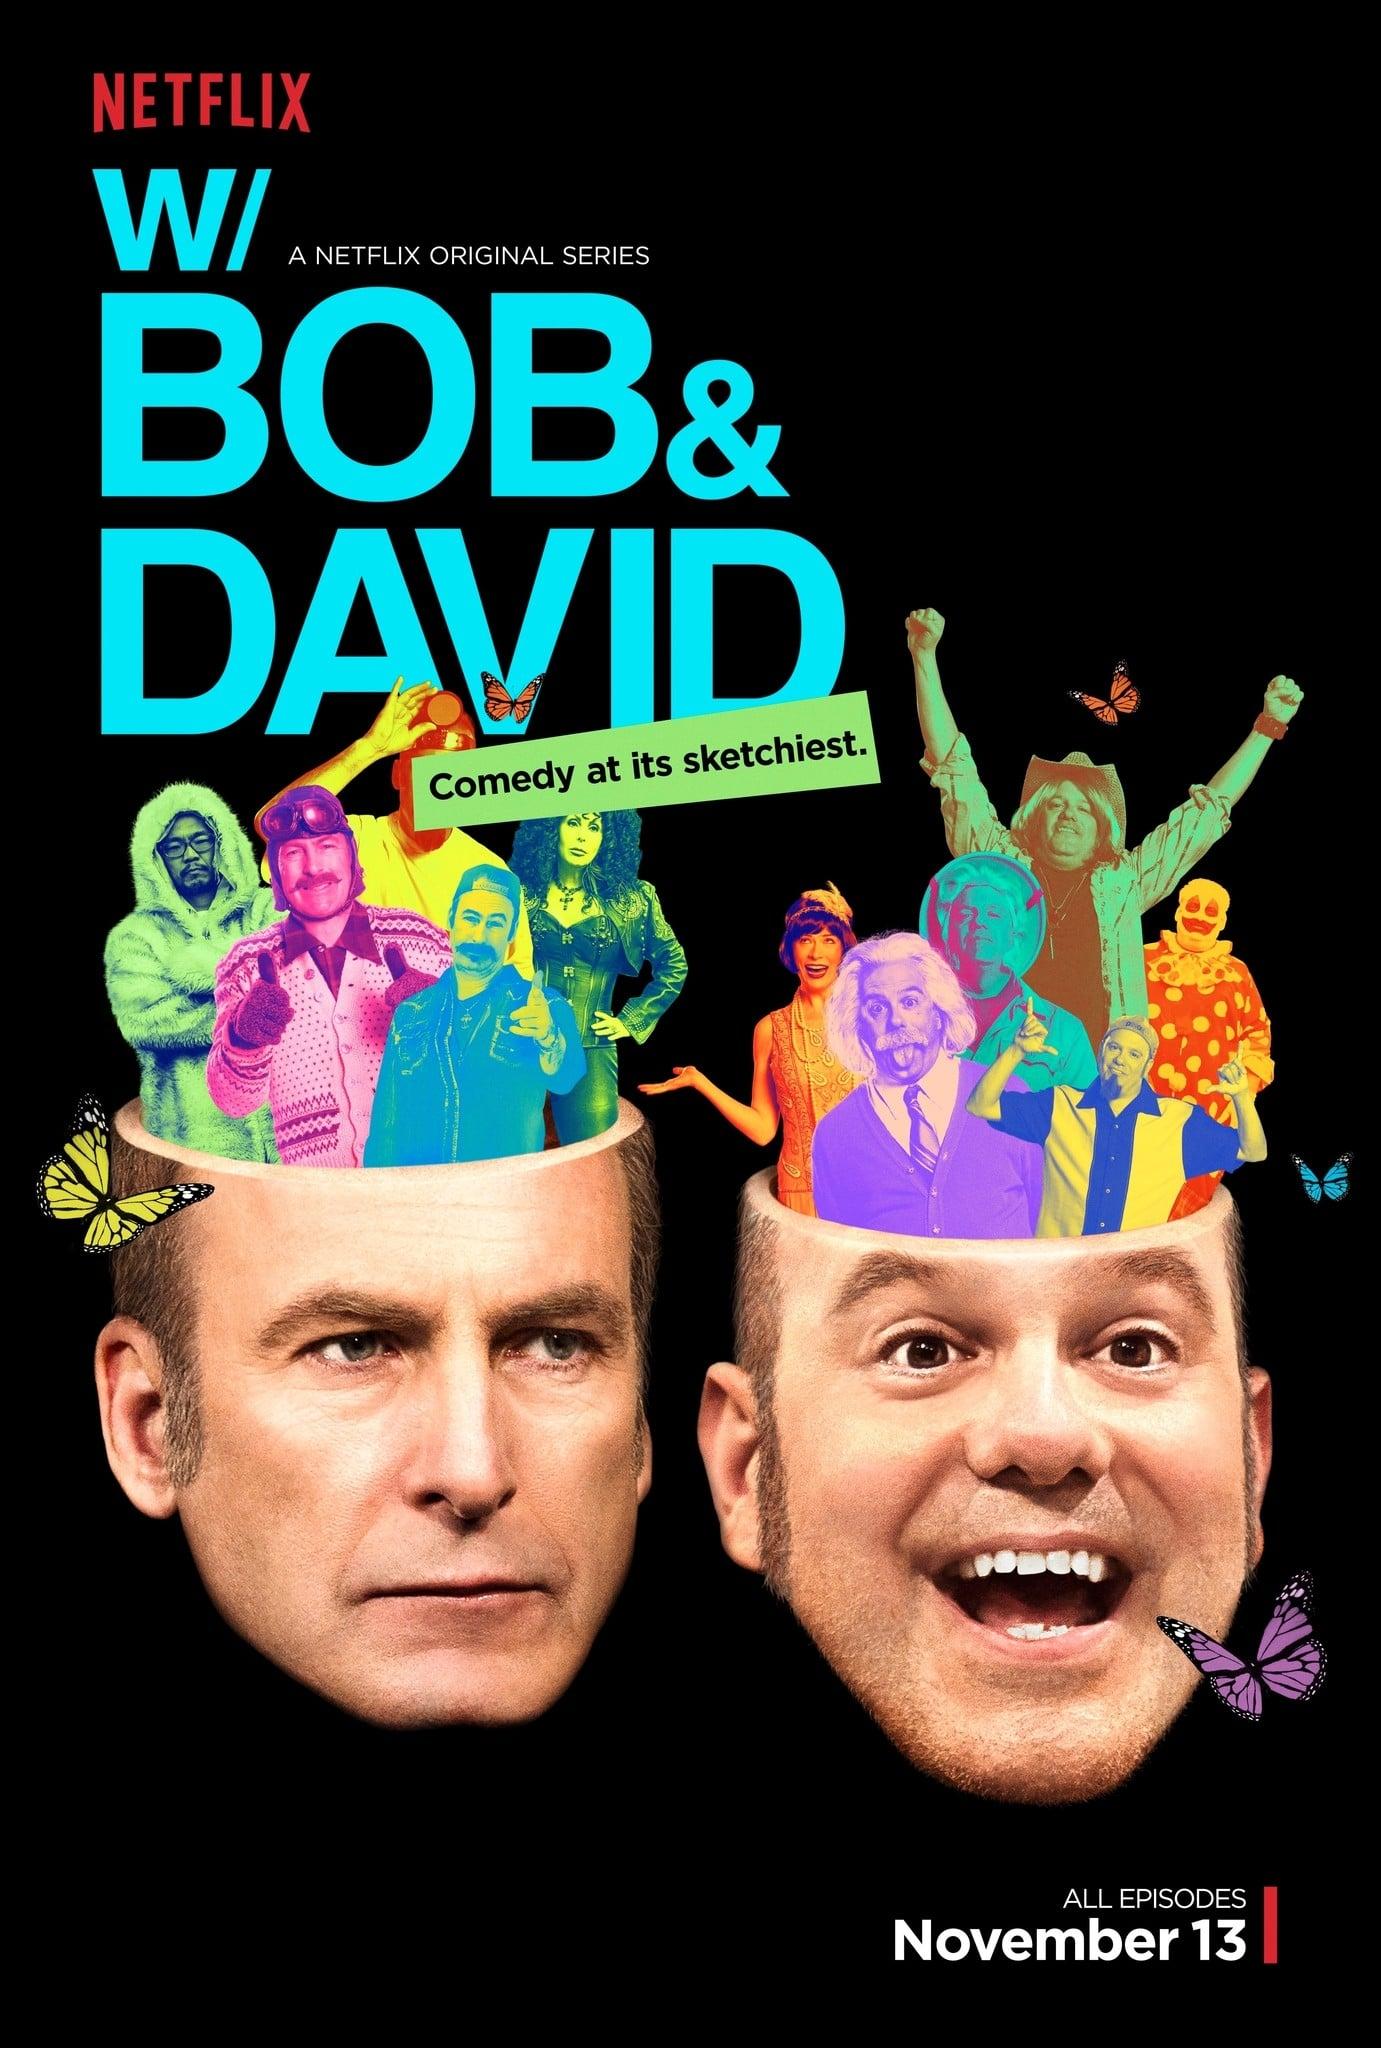 With Bob and David